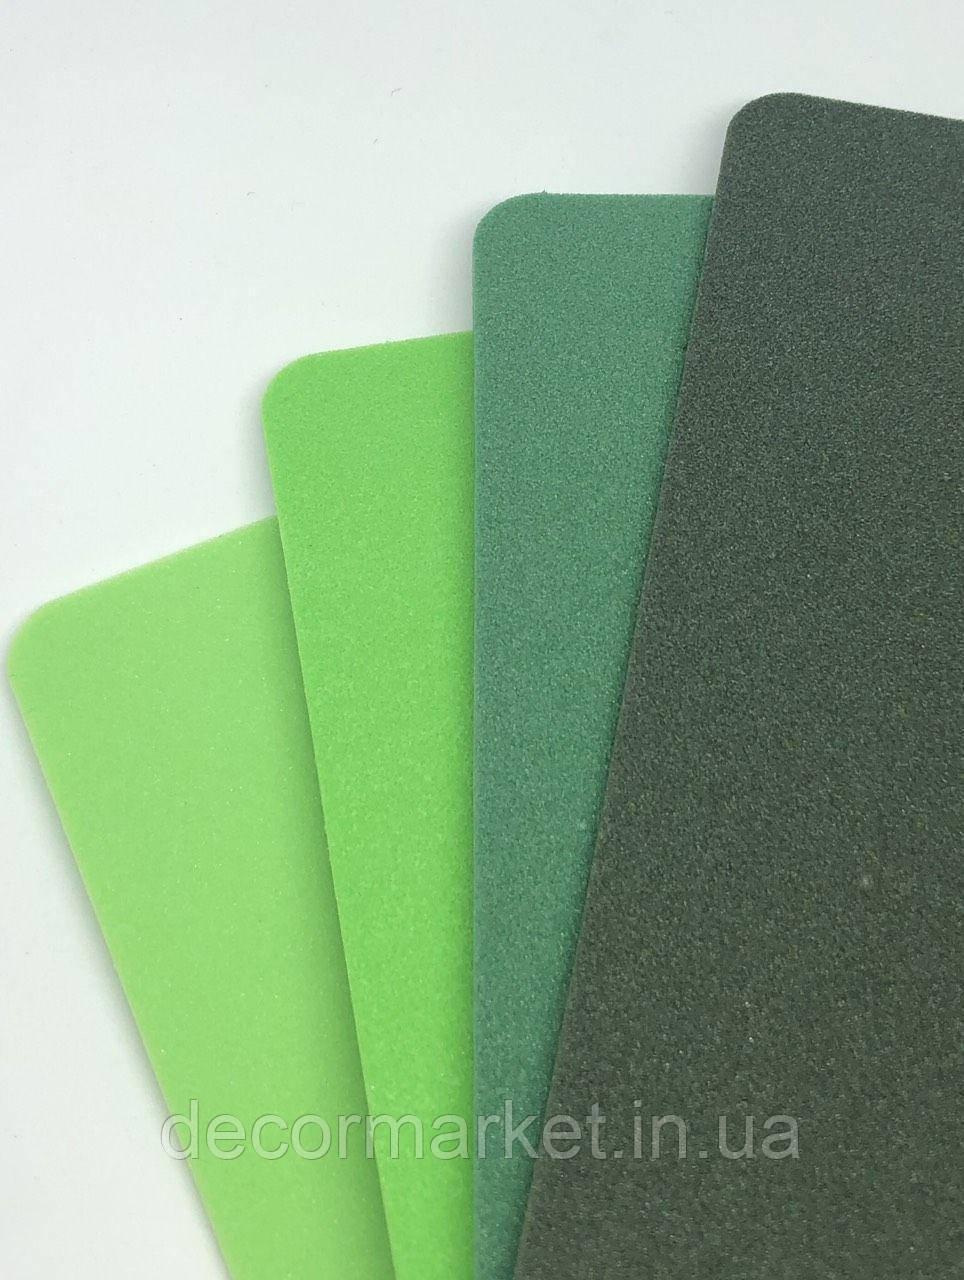 Фоамиран ЕВА 2мм темно-зеленый лист 1,50х1м